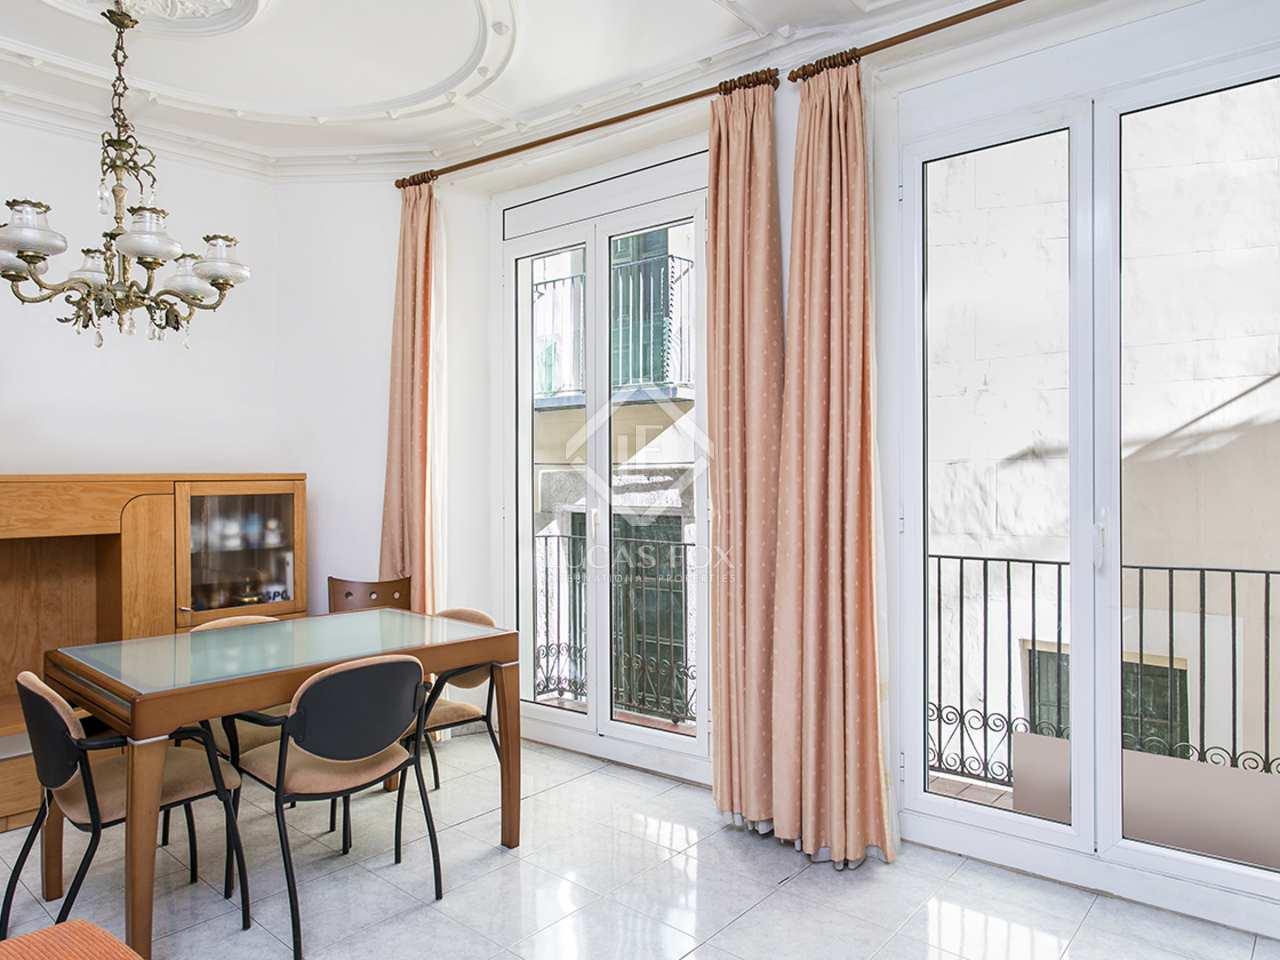 Appartement de 96m a vendre g tico barcelone for Appartement avec piscine barcelone